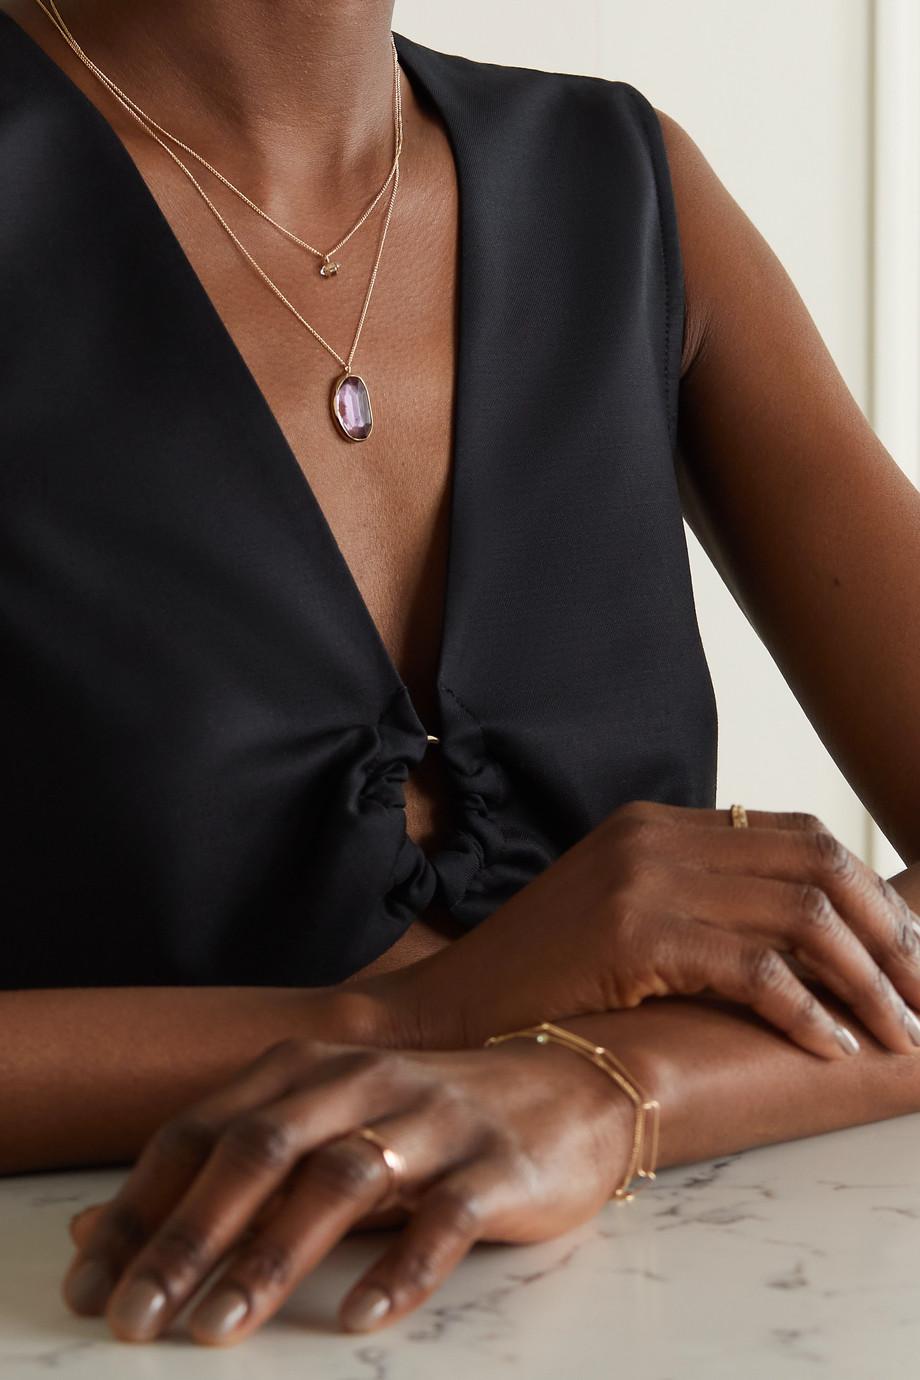 Melissa Joy Manning 14-karat recycled gold amethyst necklace